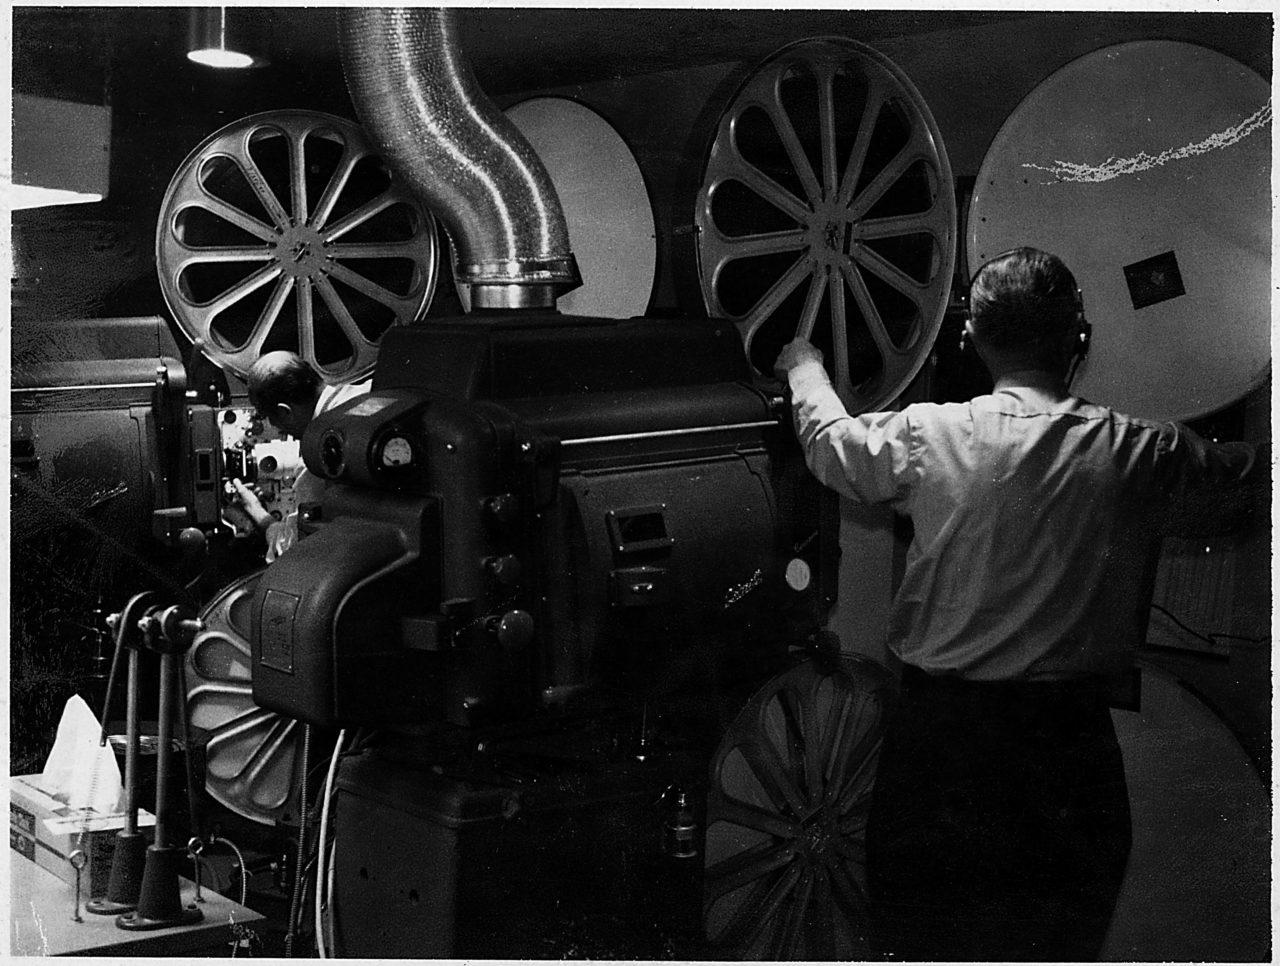 Projection Equipment - c. 1963